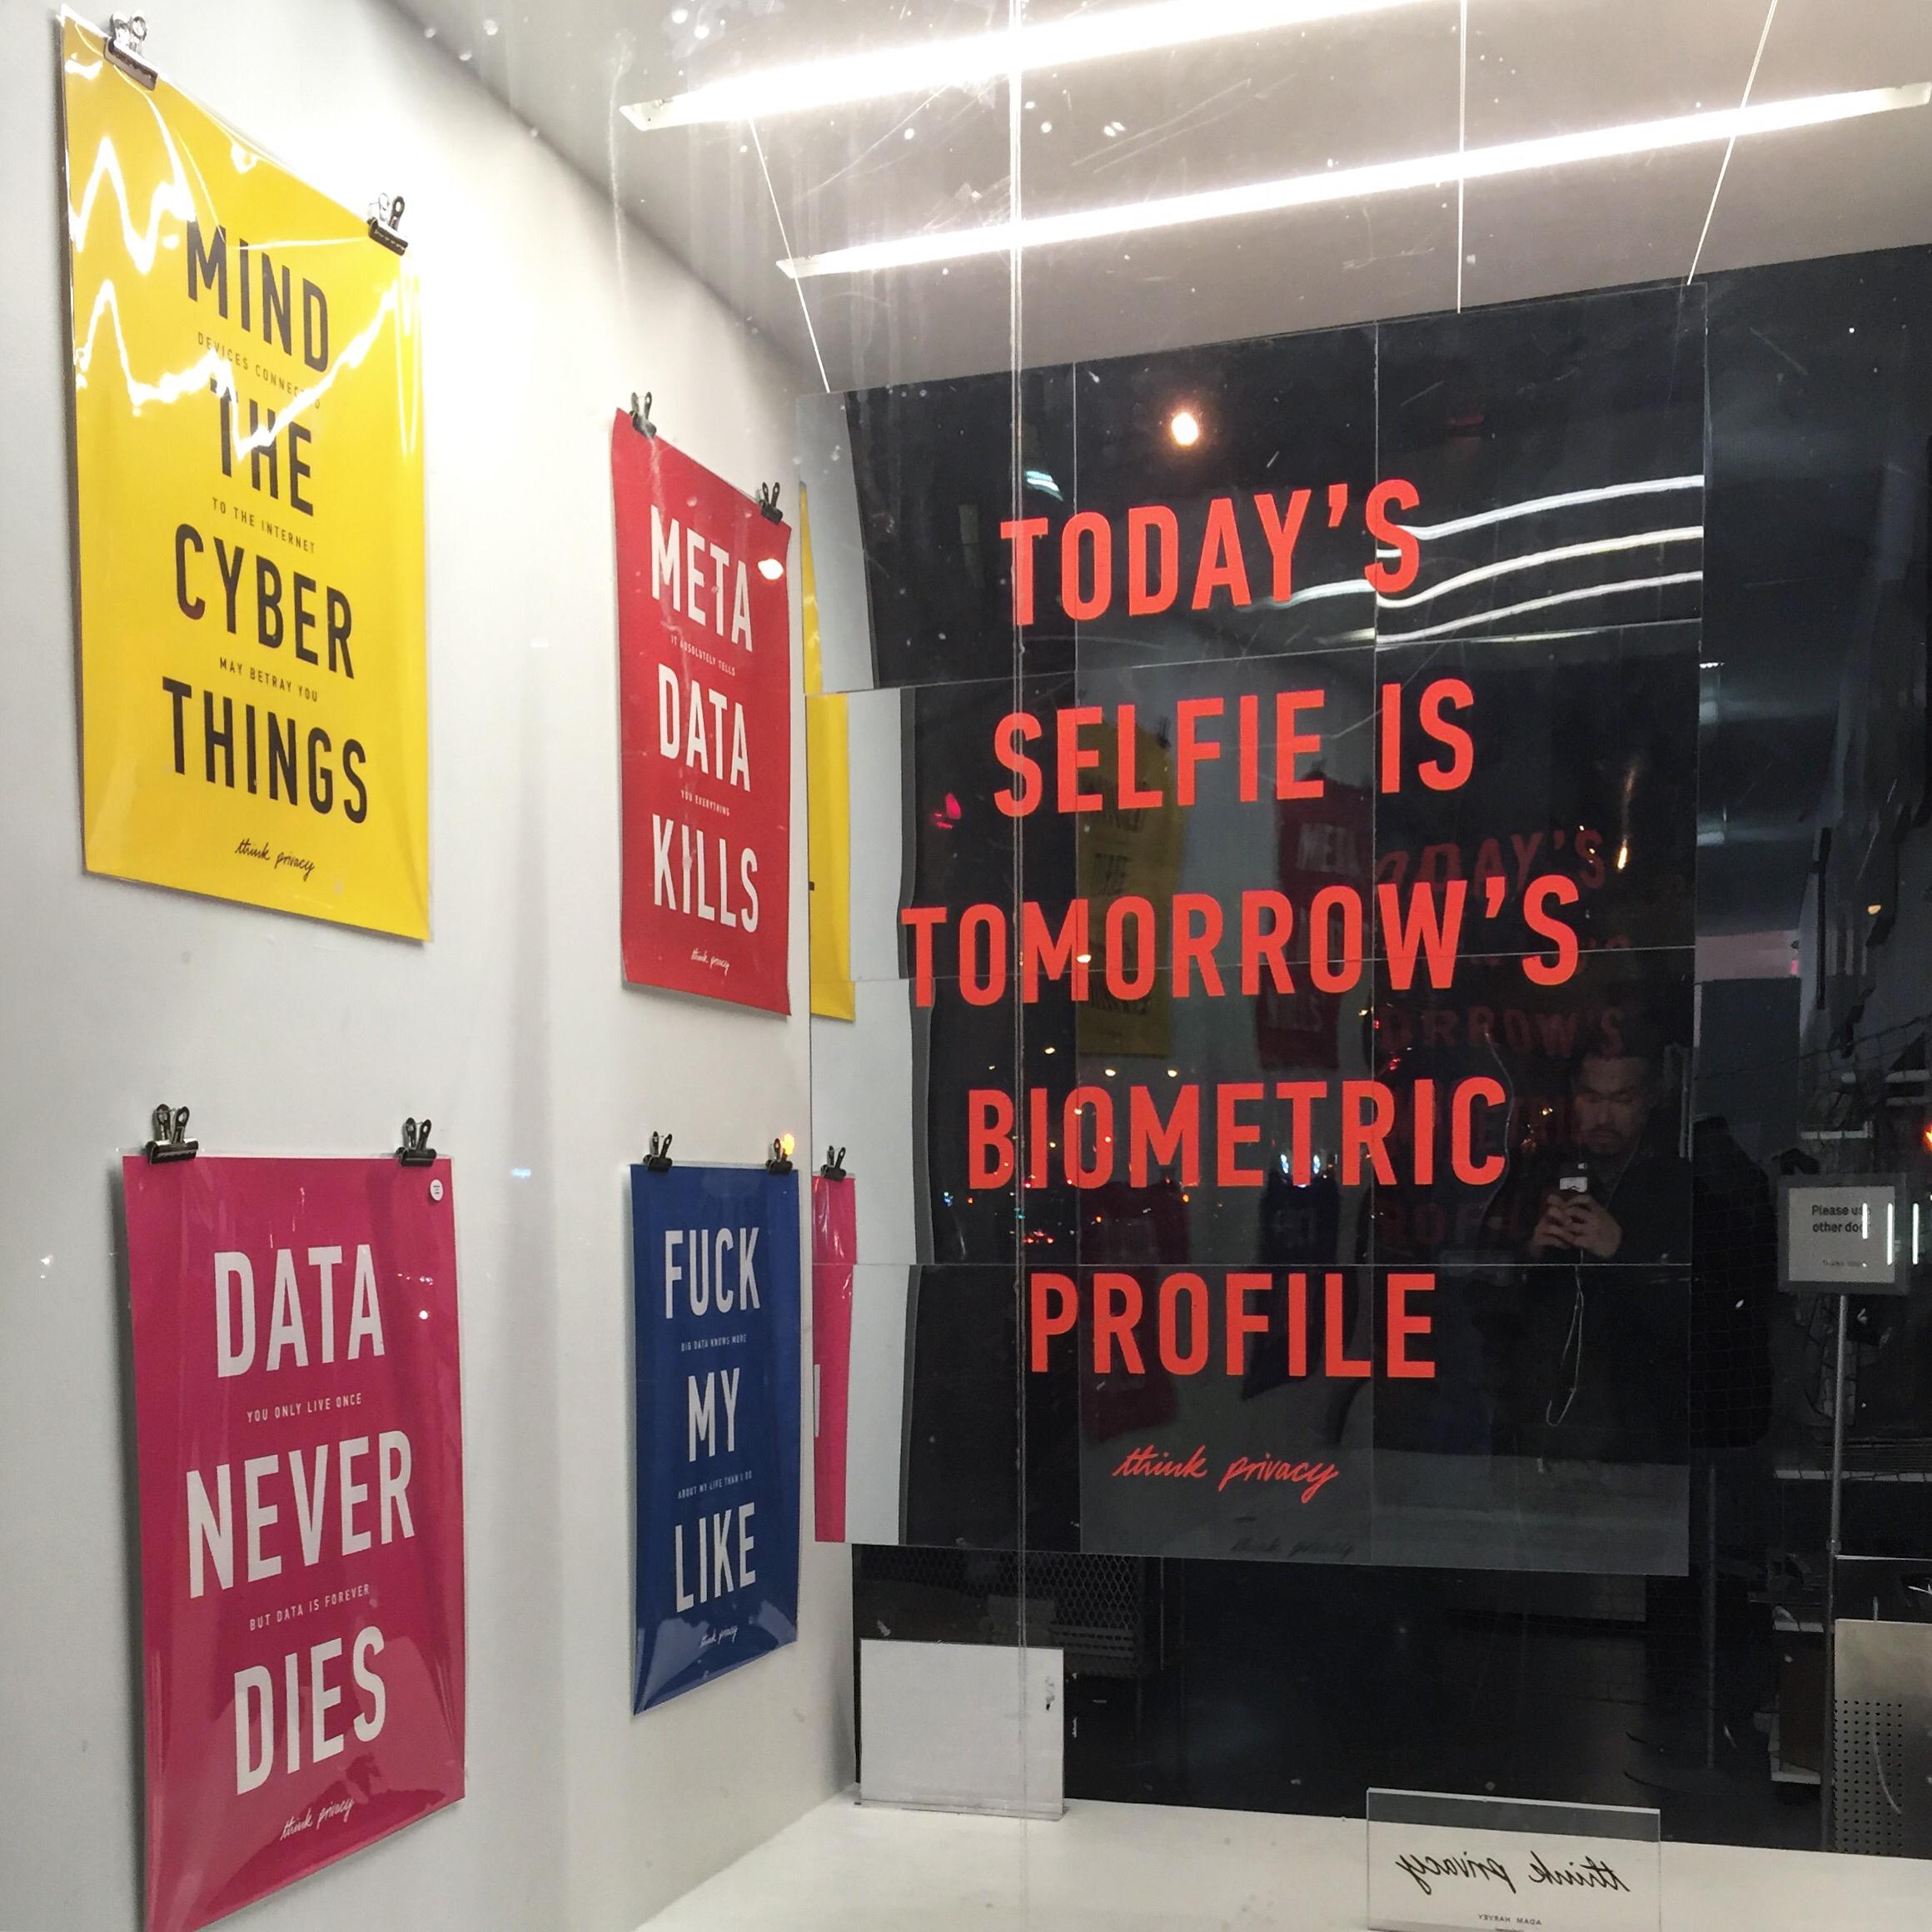 Today's Selfie is Tomorrow's Biometric Profile